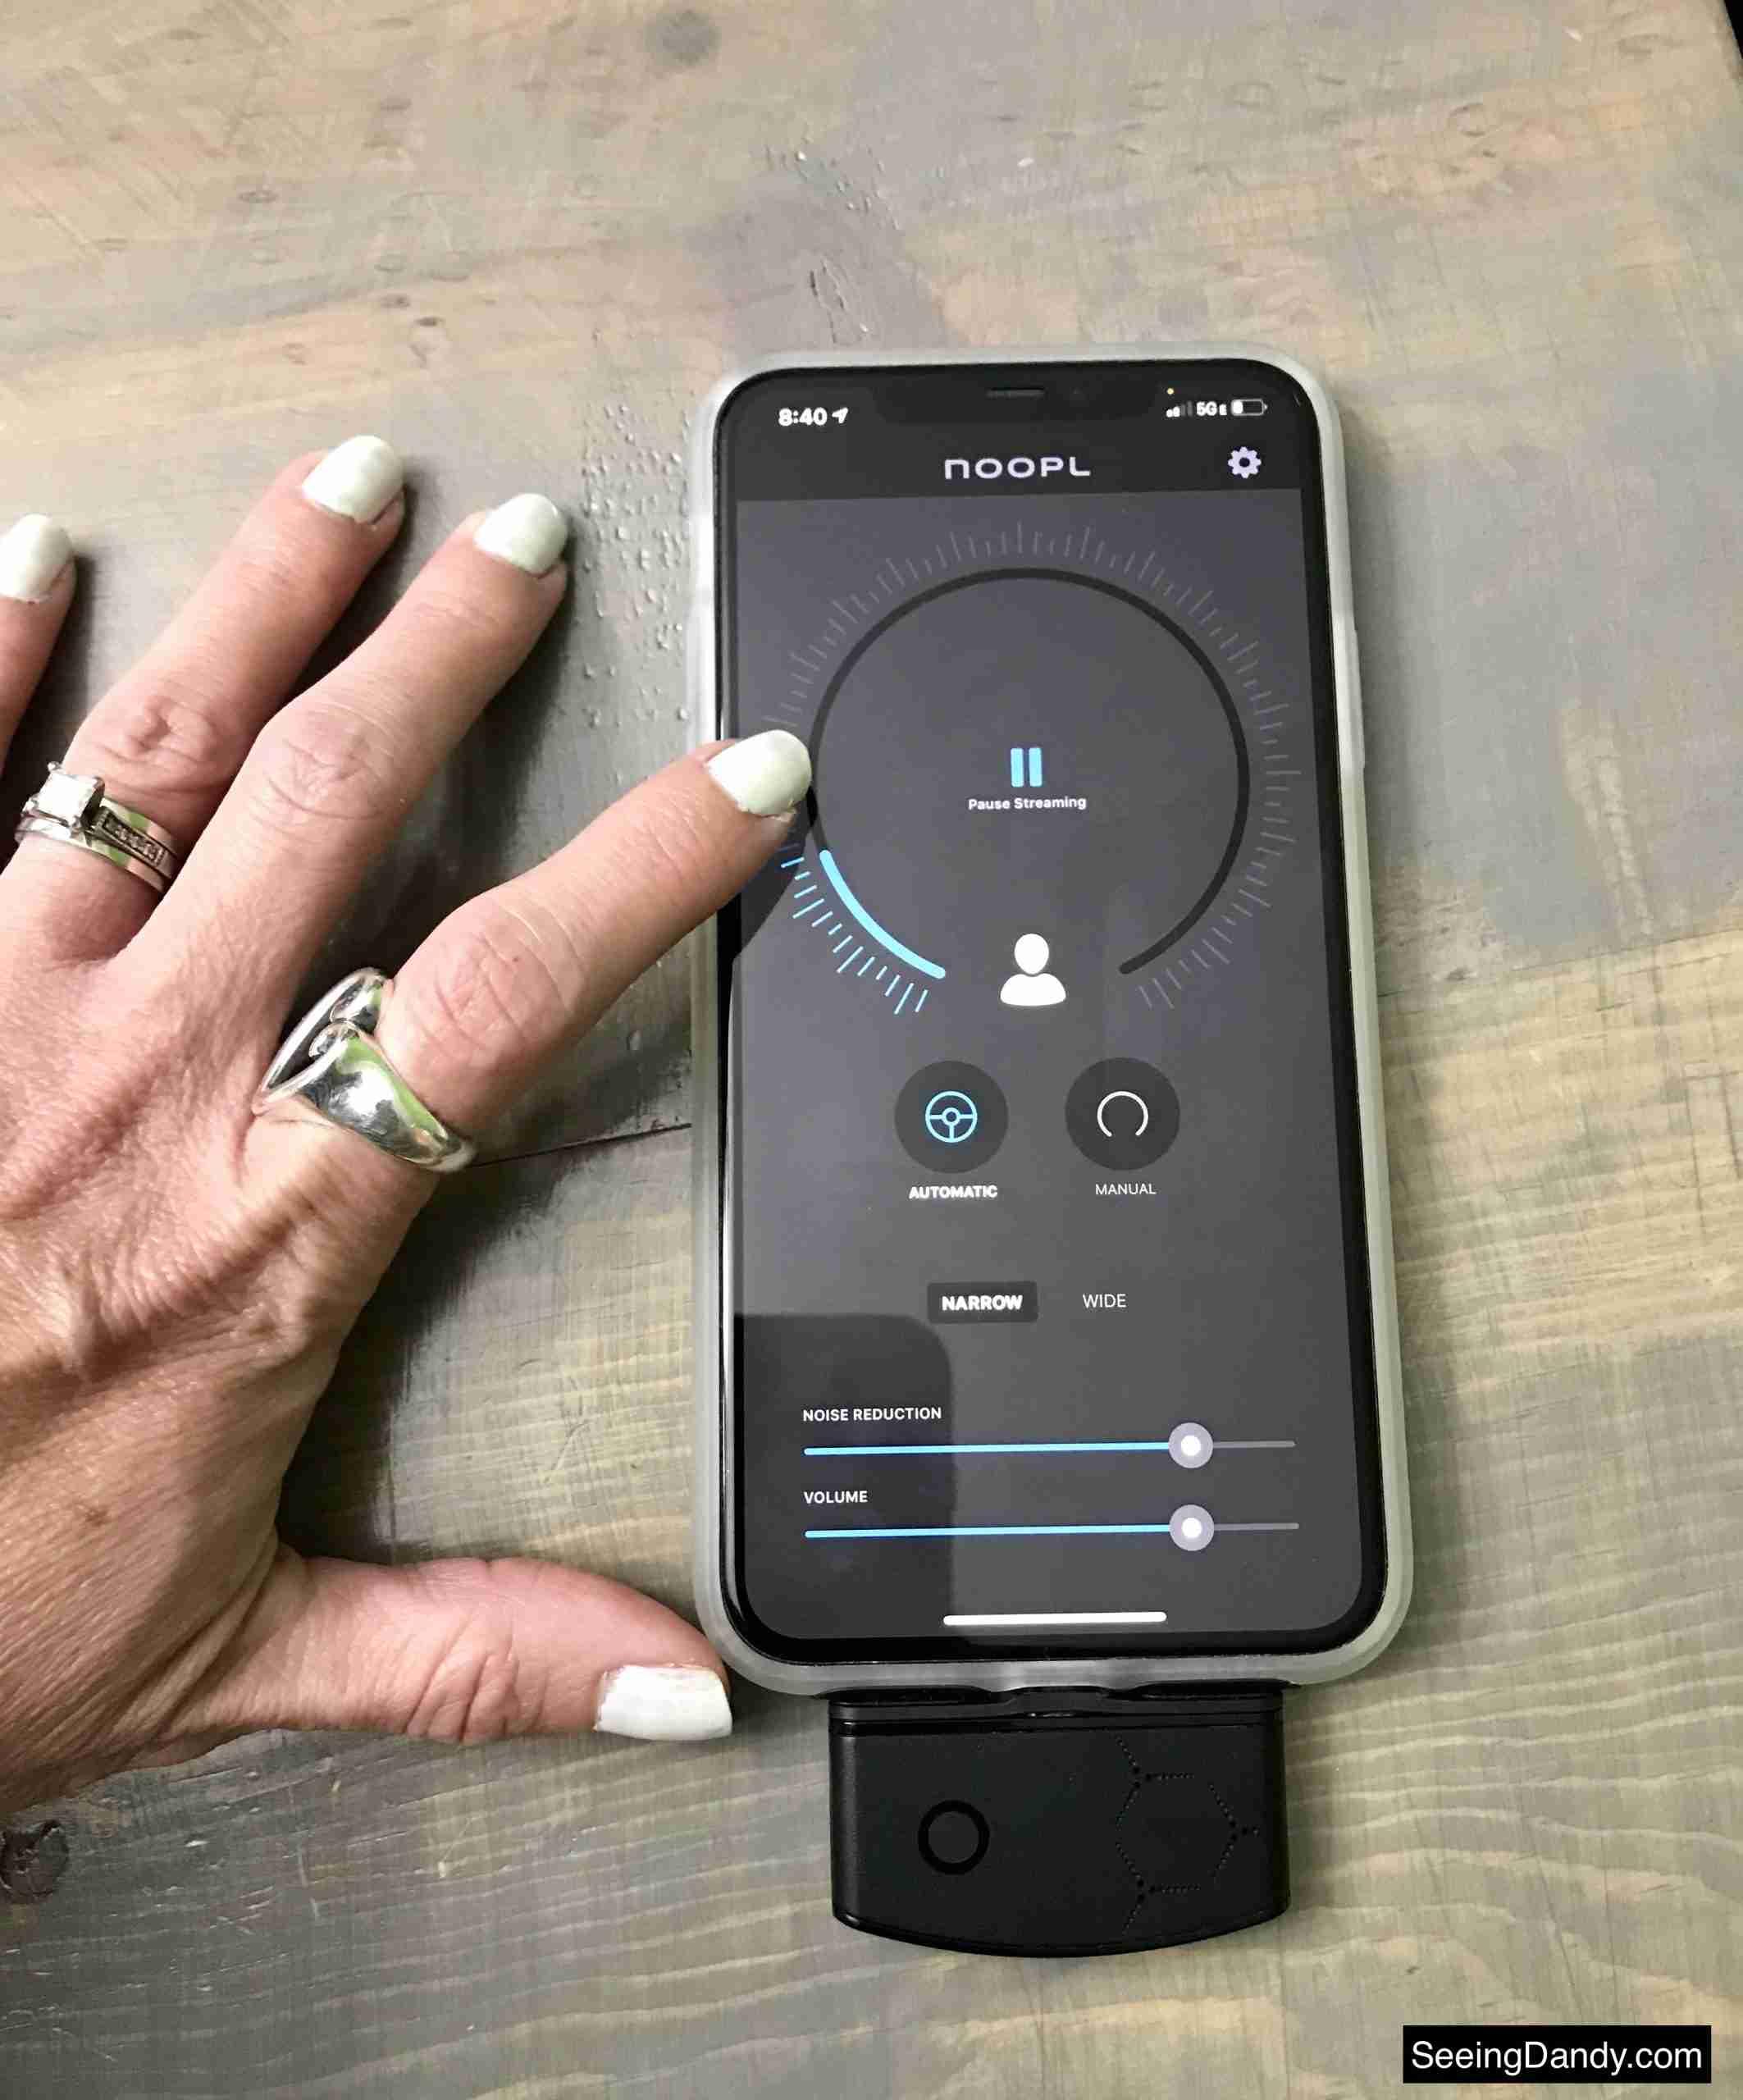 noopl hearing enhancer, hearing device, hearing enhancement, noopl app, noopl device, noopl multi directional microphone, iphone 11 pro